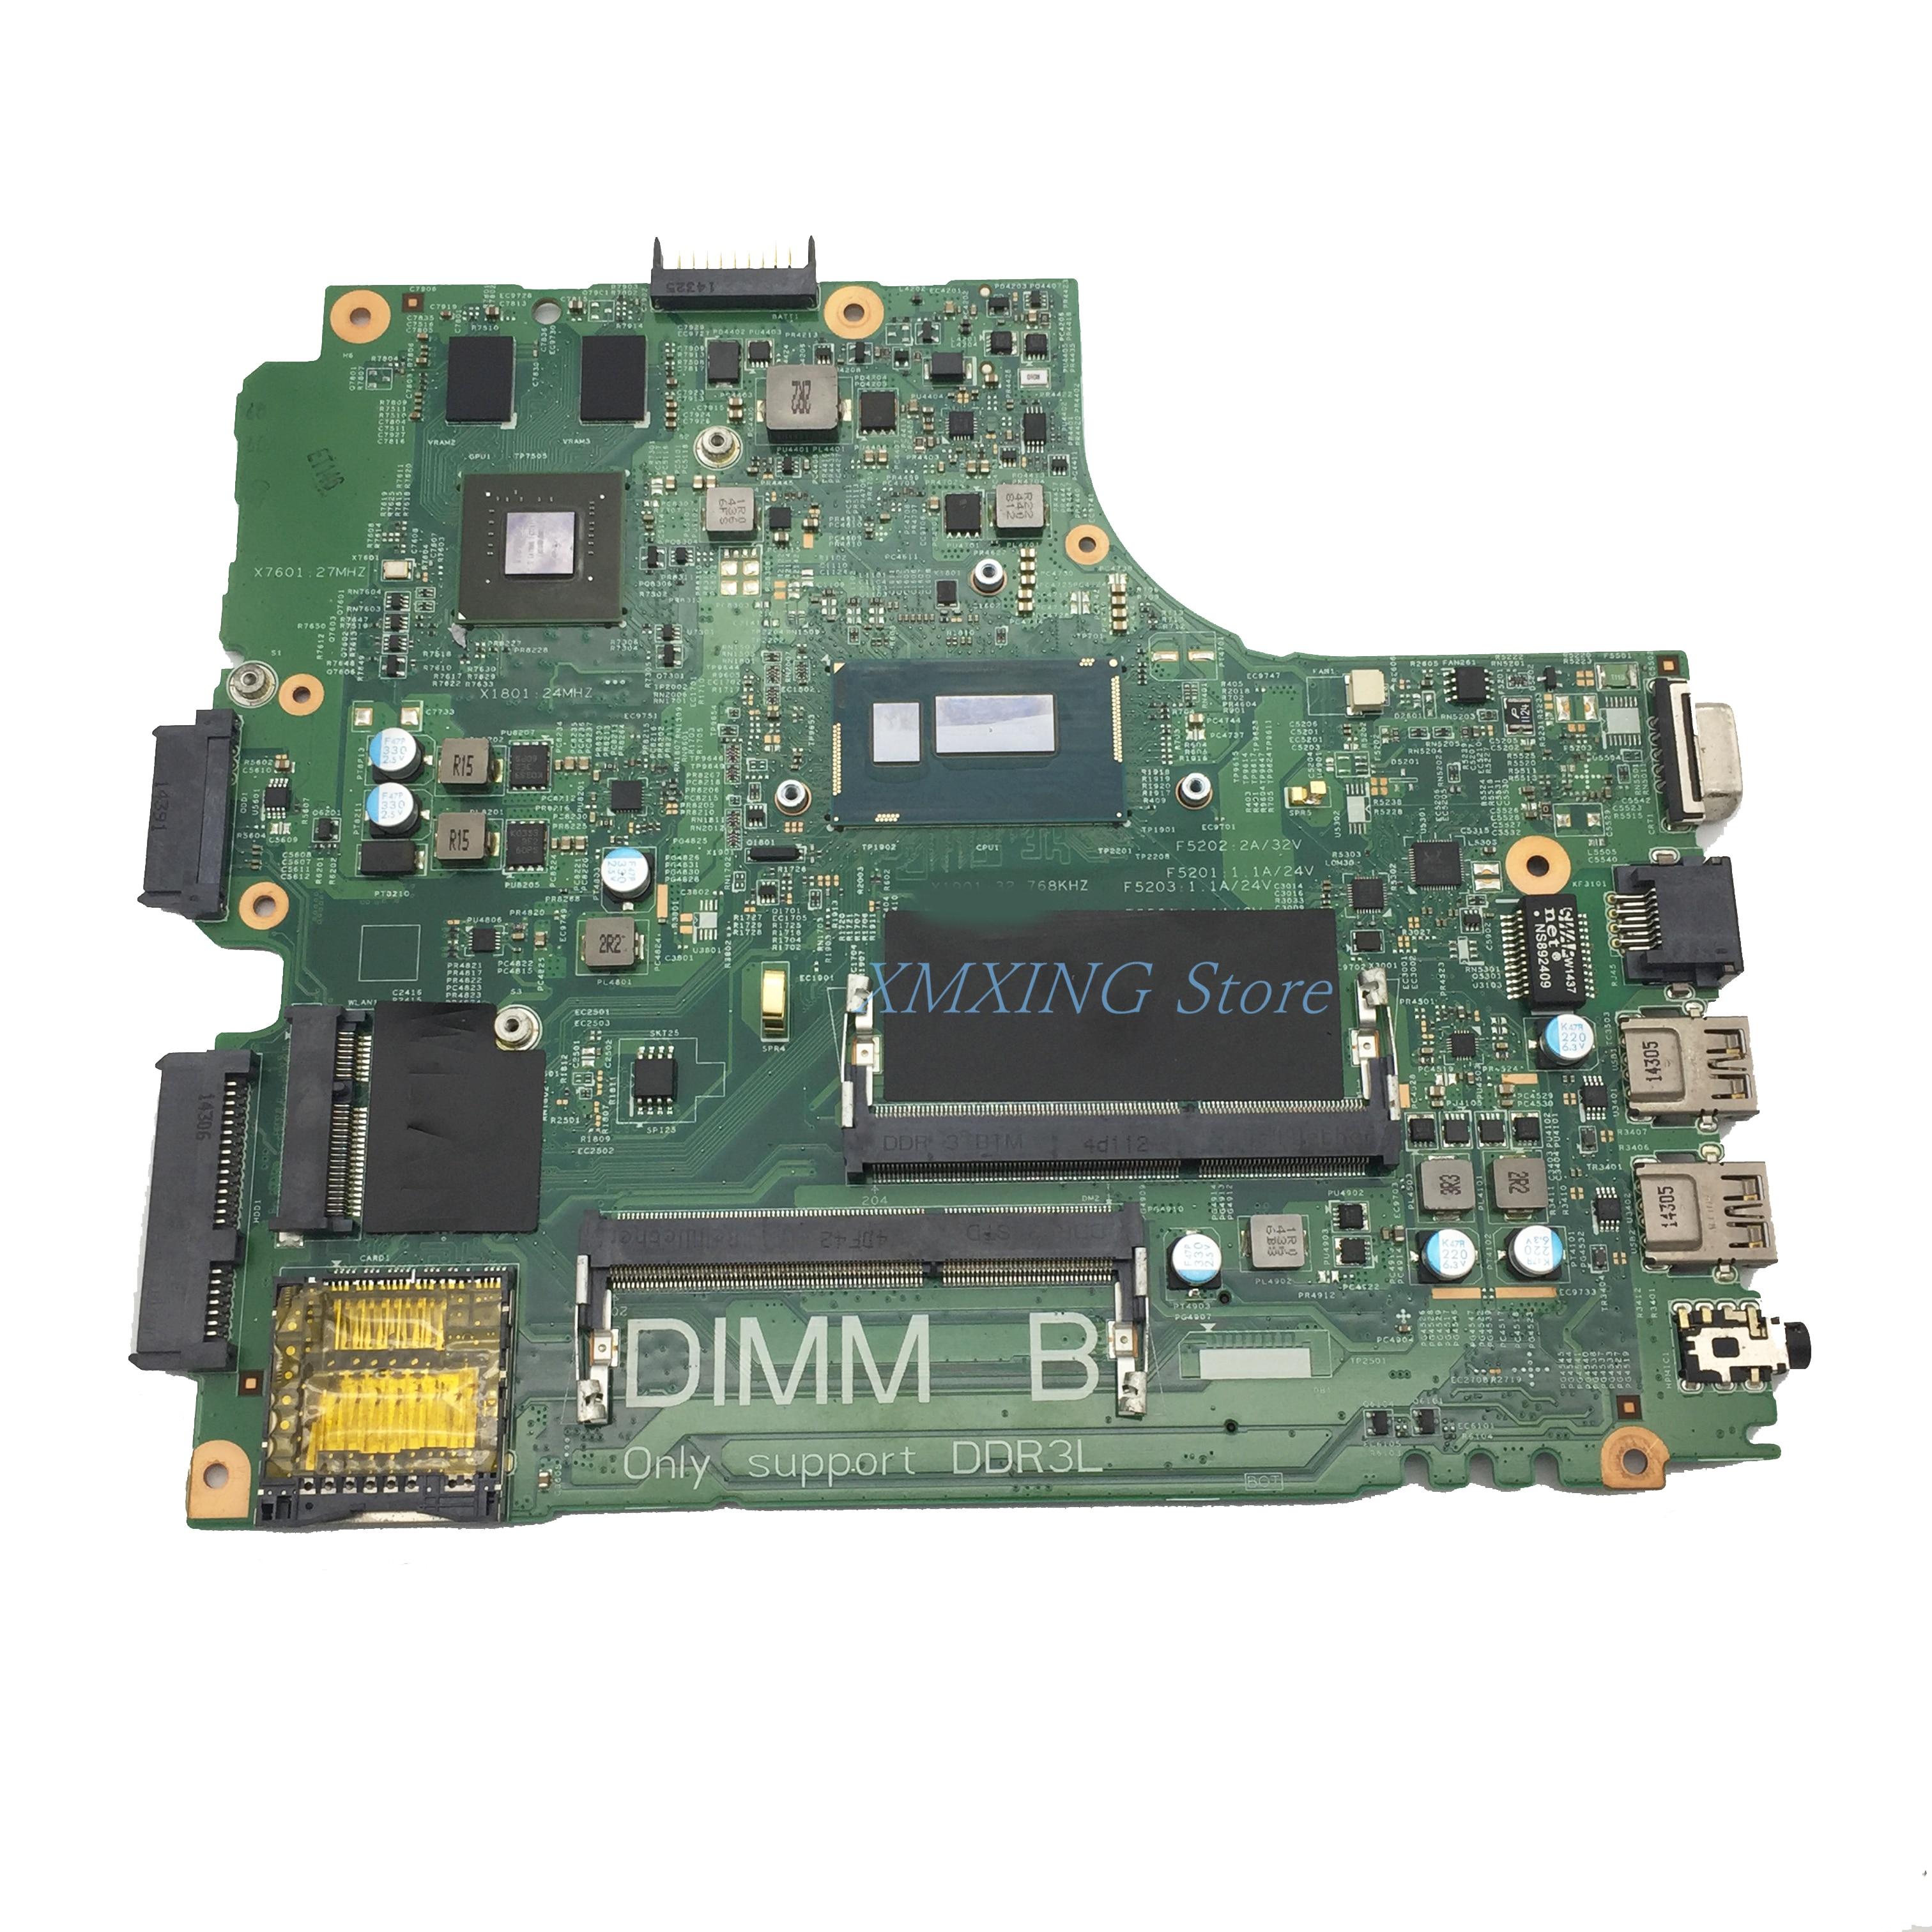 FULCOL لديل خط العرض 3437 اللوحة المحمول I3-4010U CPU 12314-1 CN-0G9PCH 0G9PCH G9PCH اختبار 100% العمل